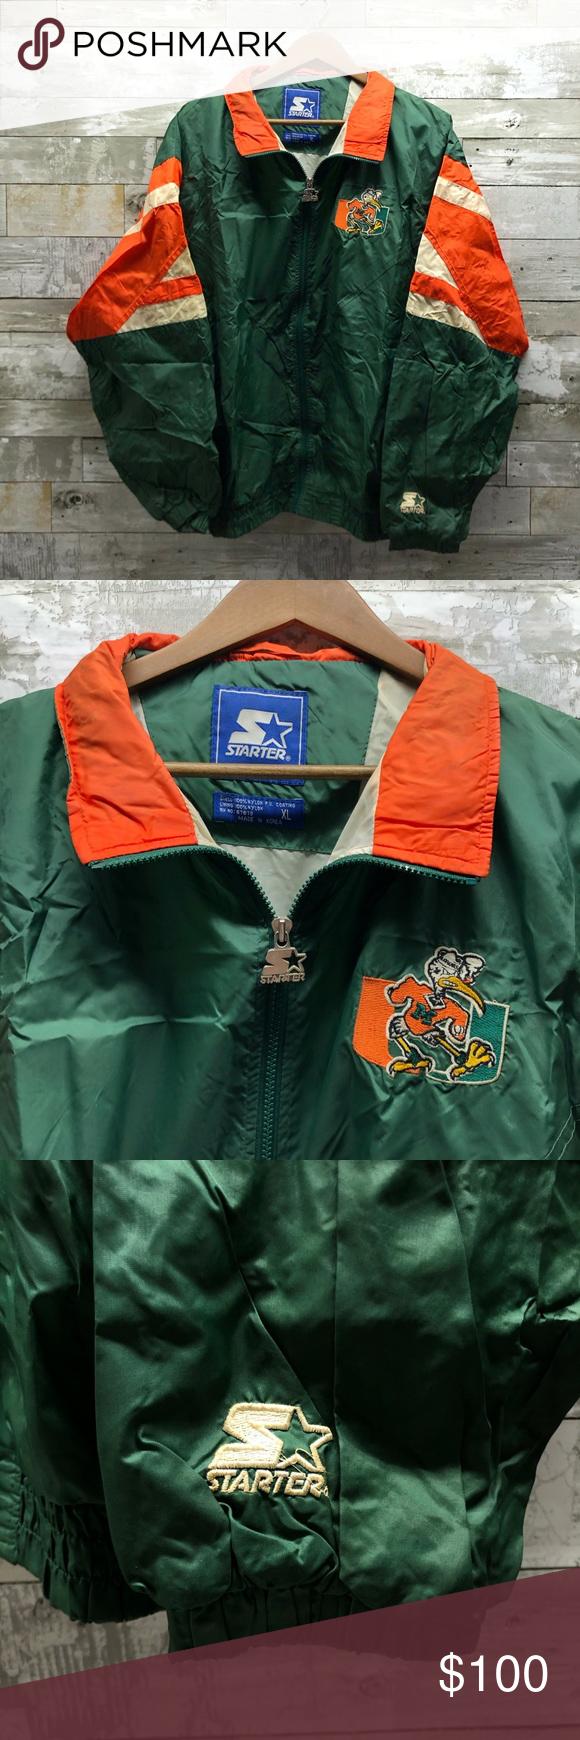 Vintage Miami Hurricane Starter Full Zip Up Jacket In 2020 Jackets Zip Ups Miami Hurricanes